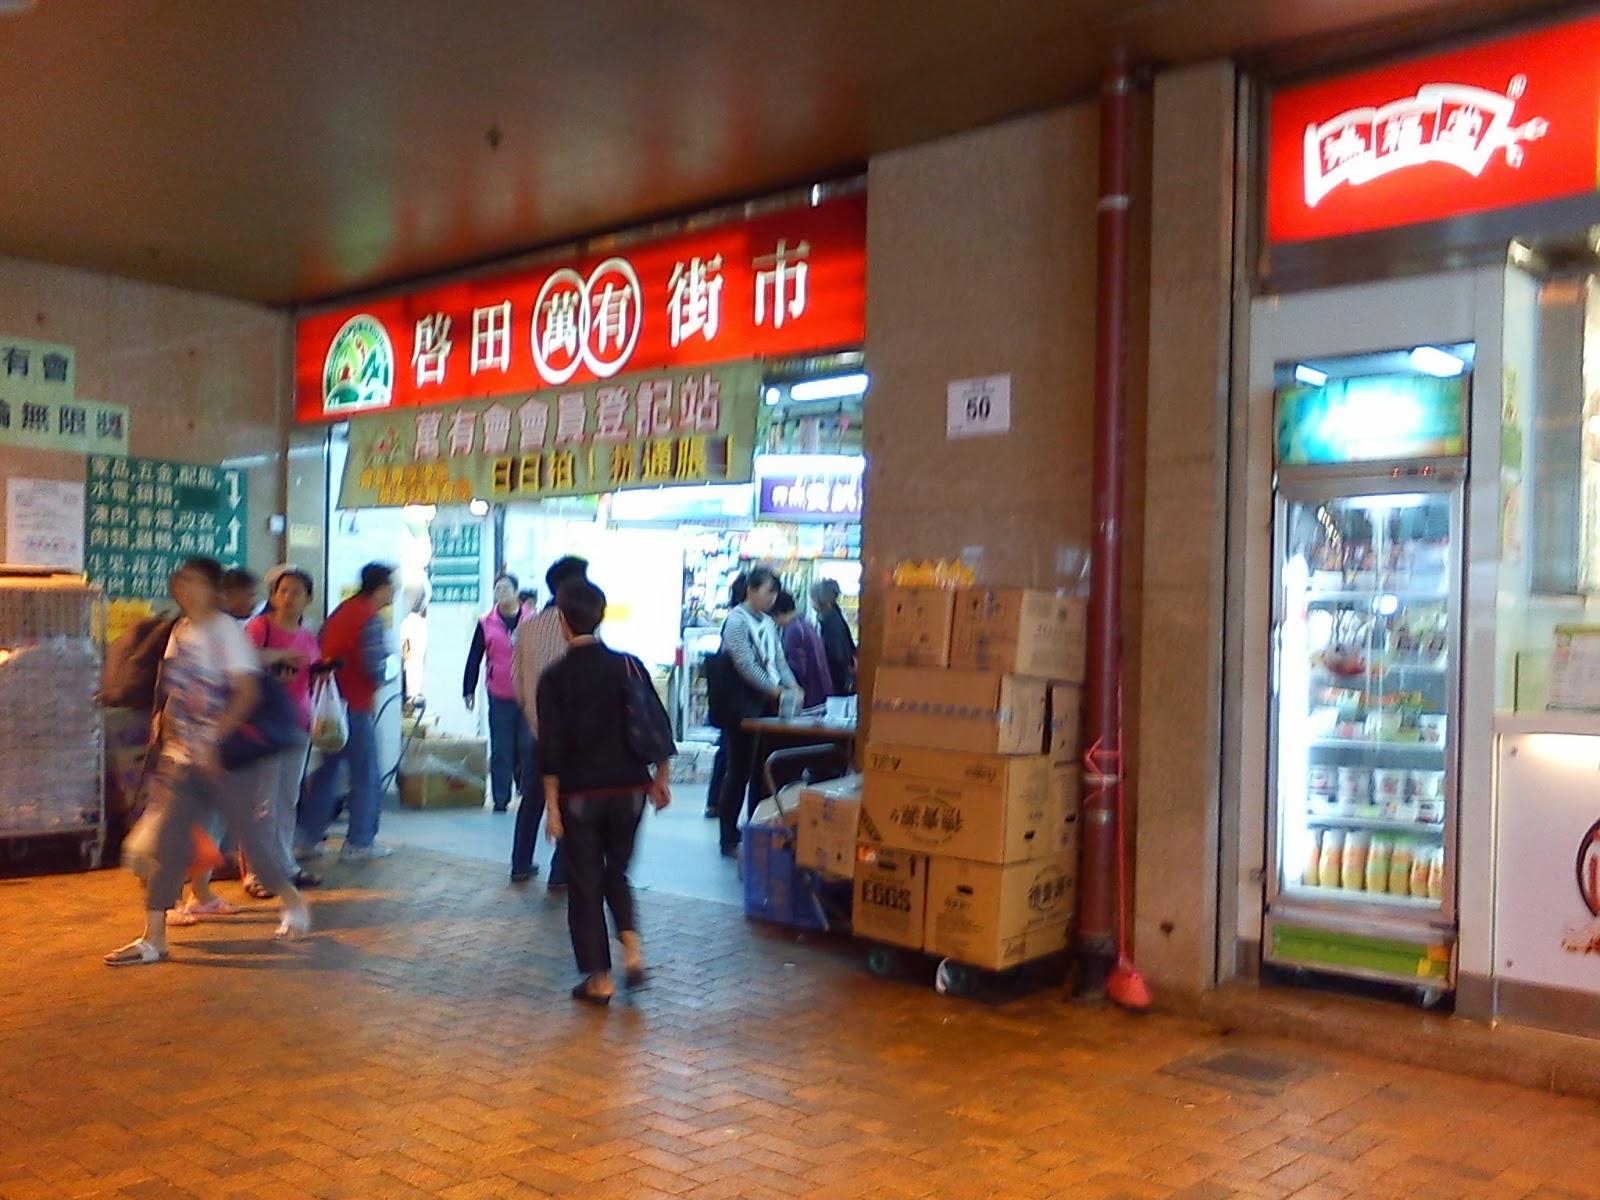 Grassroots O2: 巡視業務.領匯.啟田商場 @2011-11-12